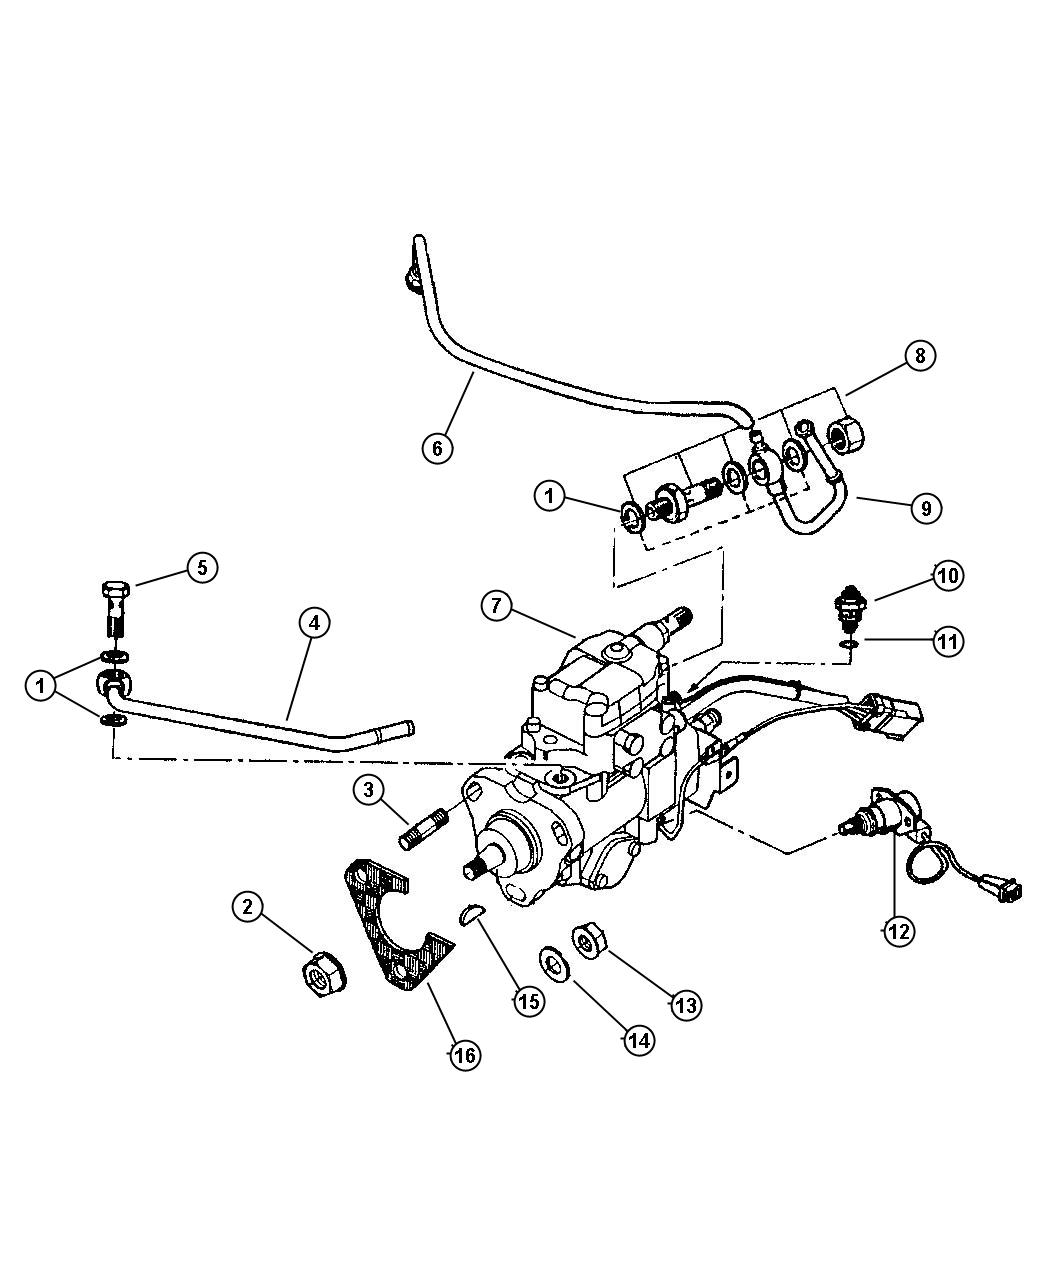 Dodge Nitro Bolt Banjo 2 8l I4 Turbosel Engine